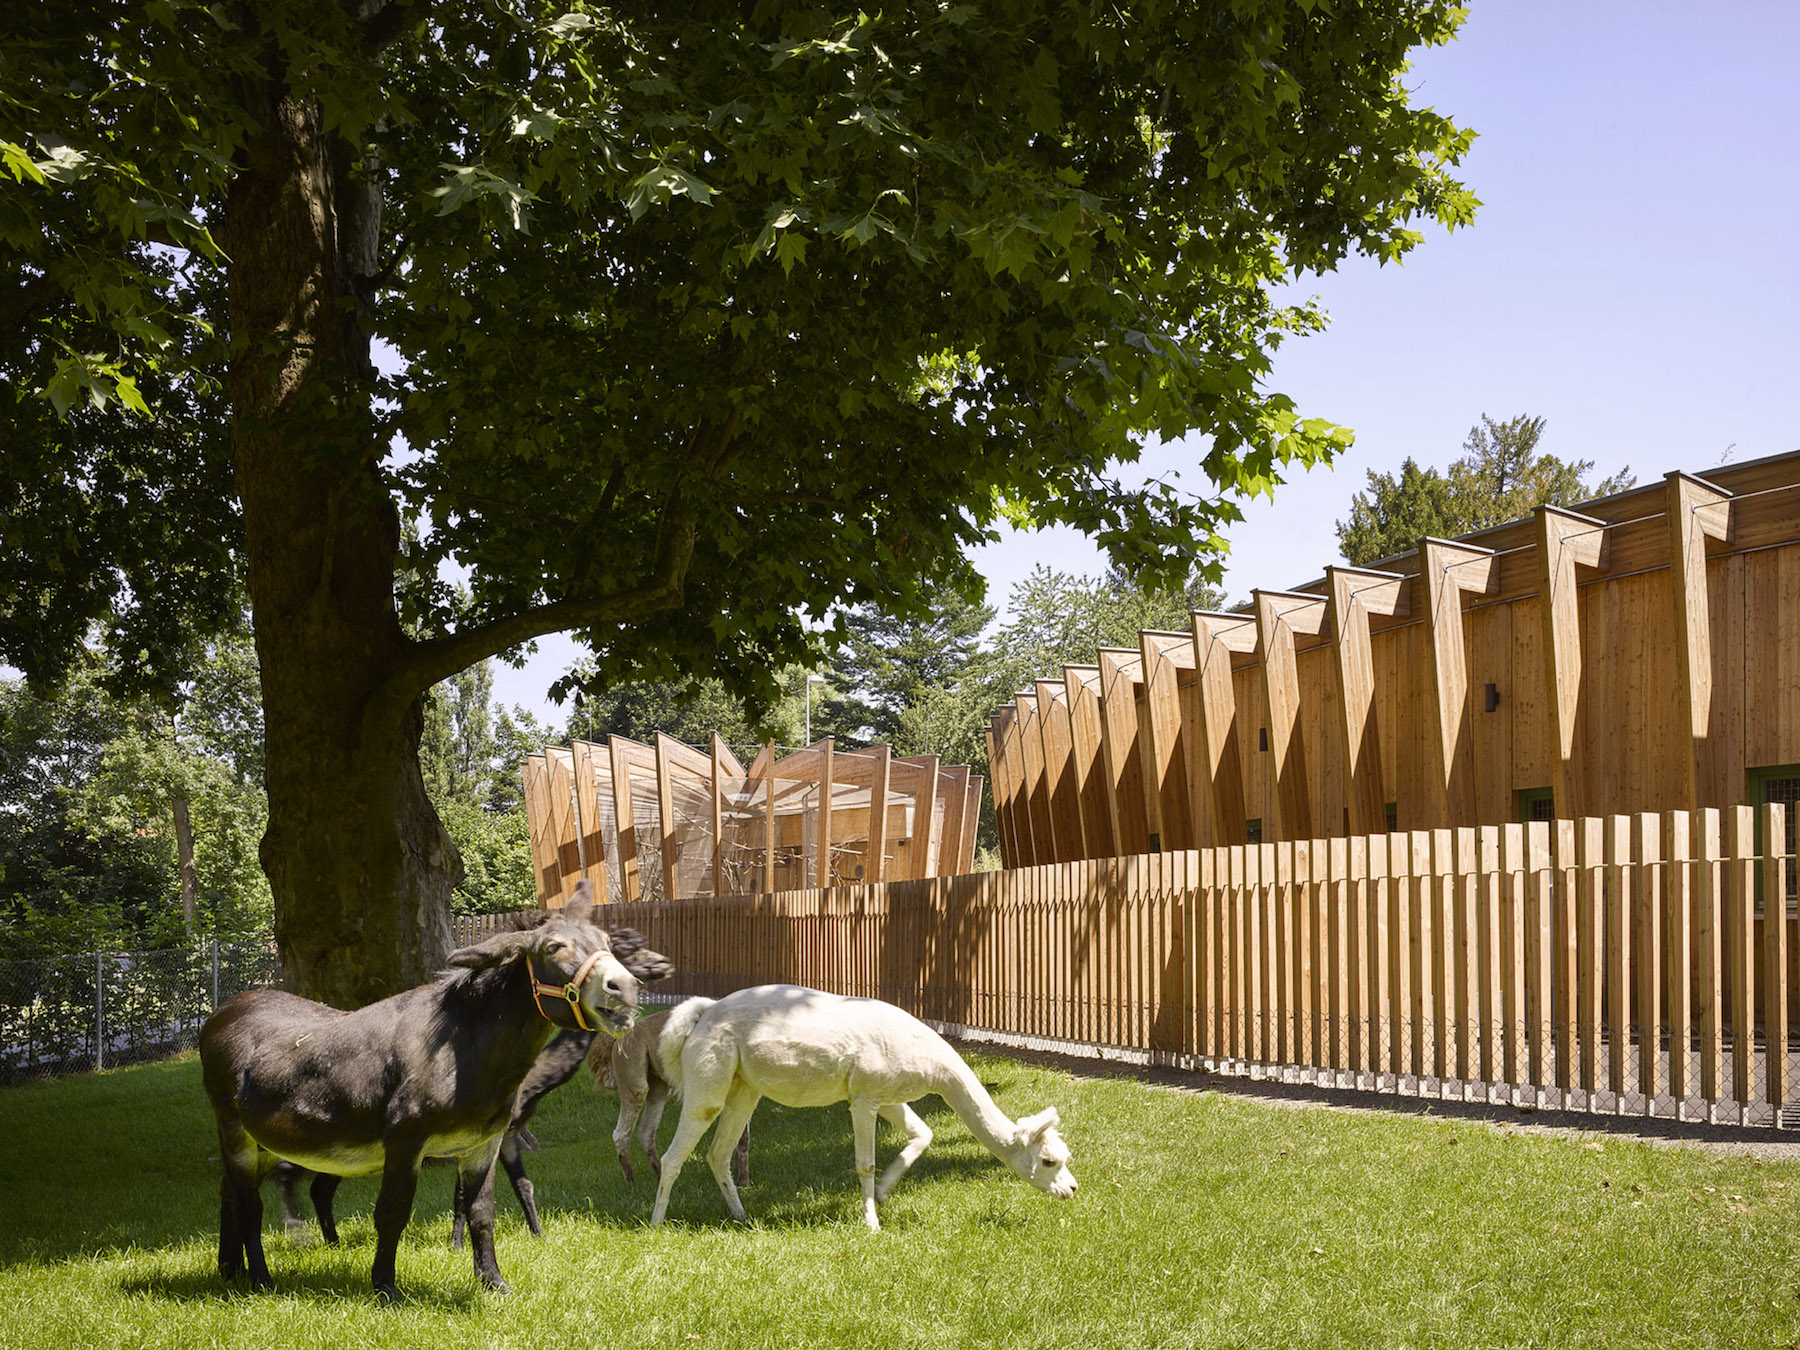 Öhringen Petting Zoo architecture